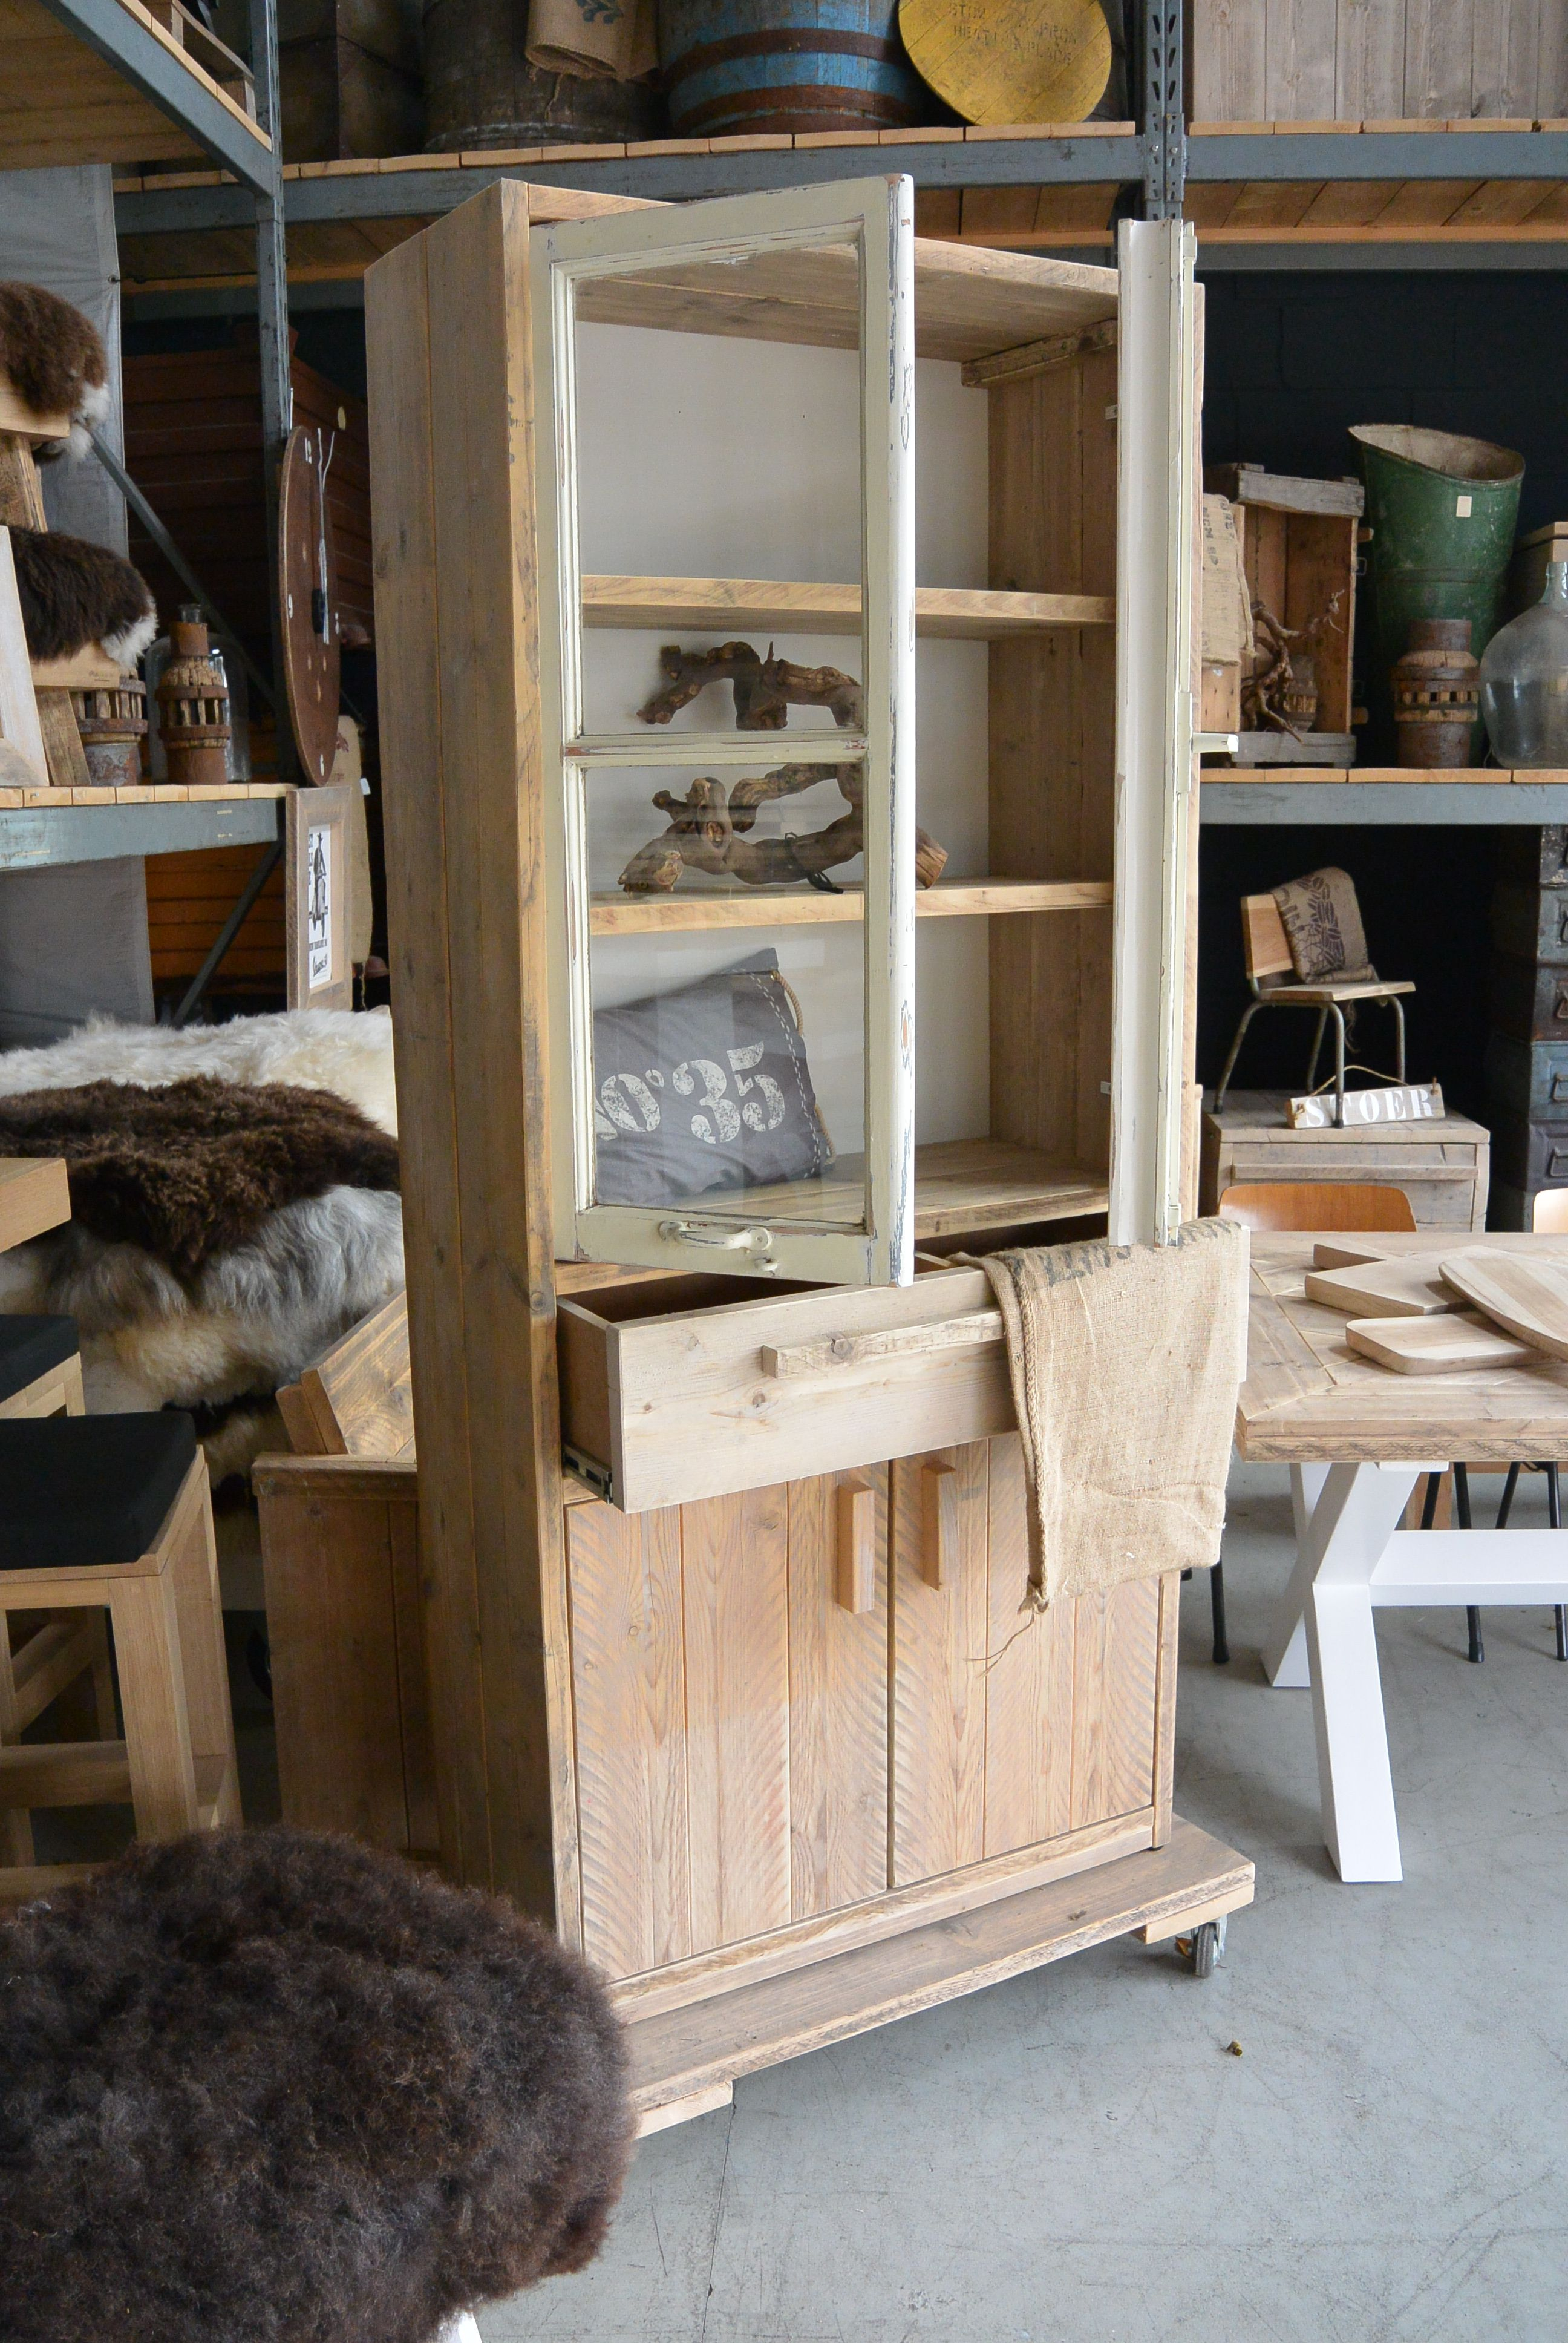 Boekenkast/ vitrinekast van steigerhout gecombineerd met echt oude ...